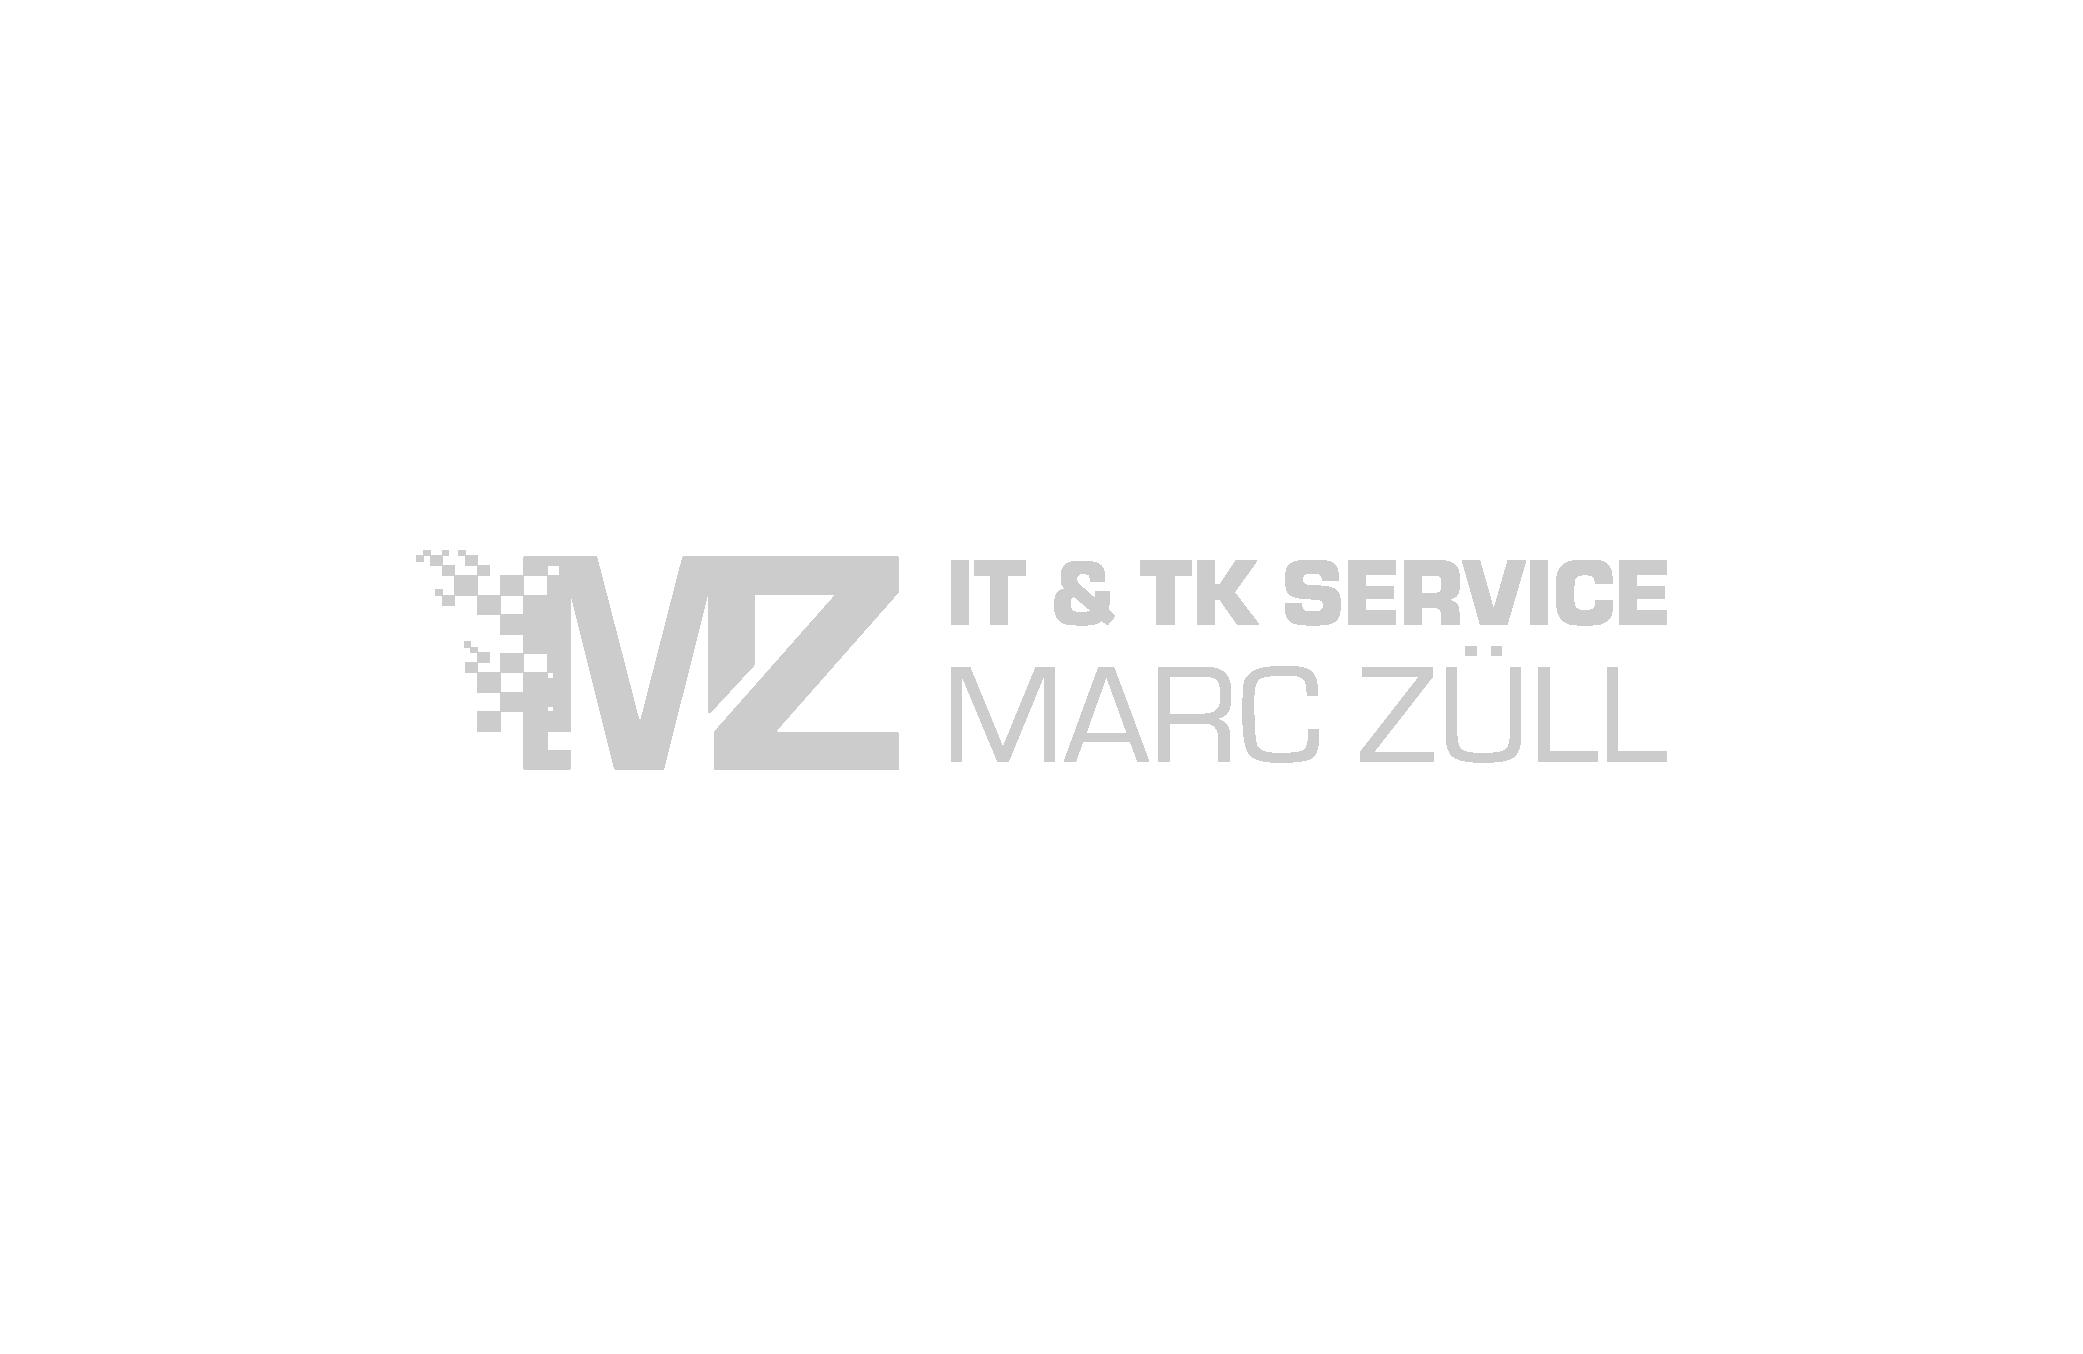 Marc Züll IT